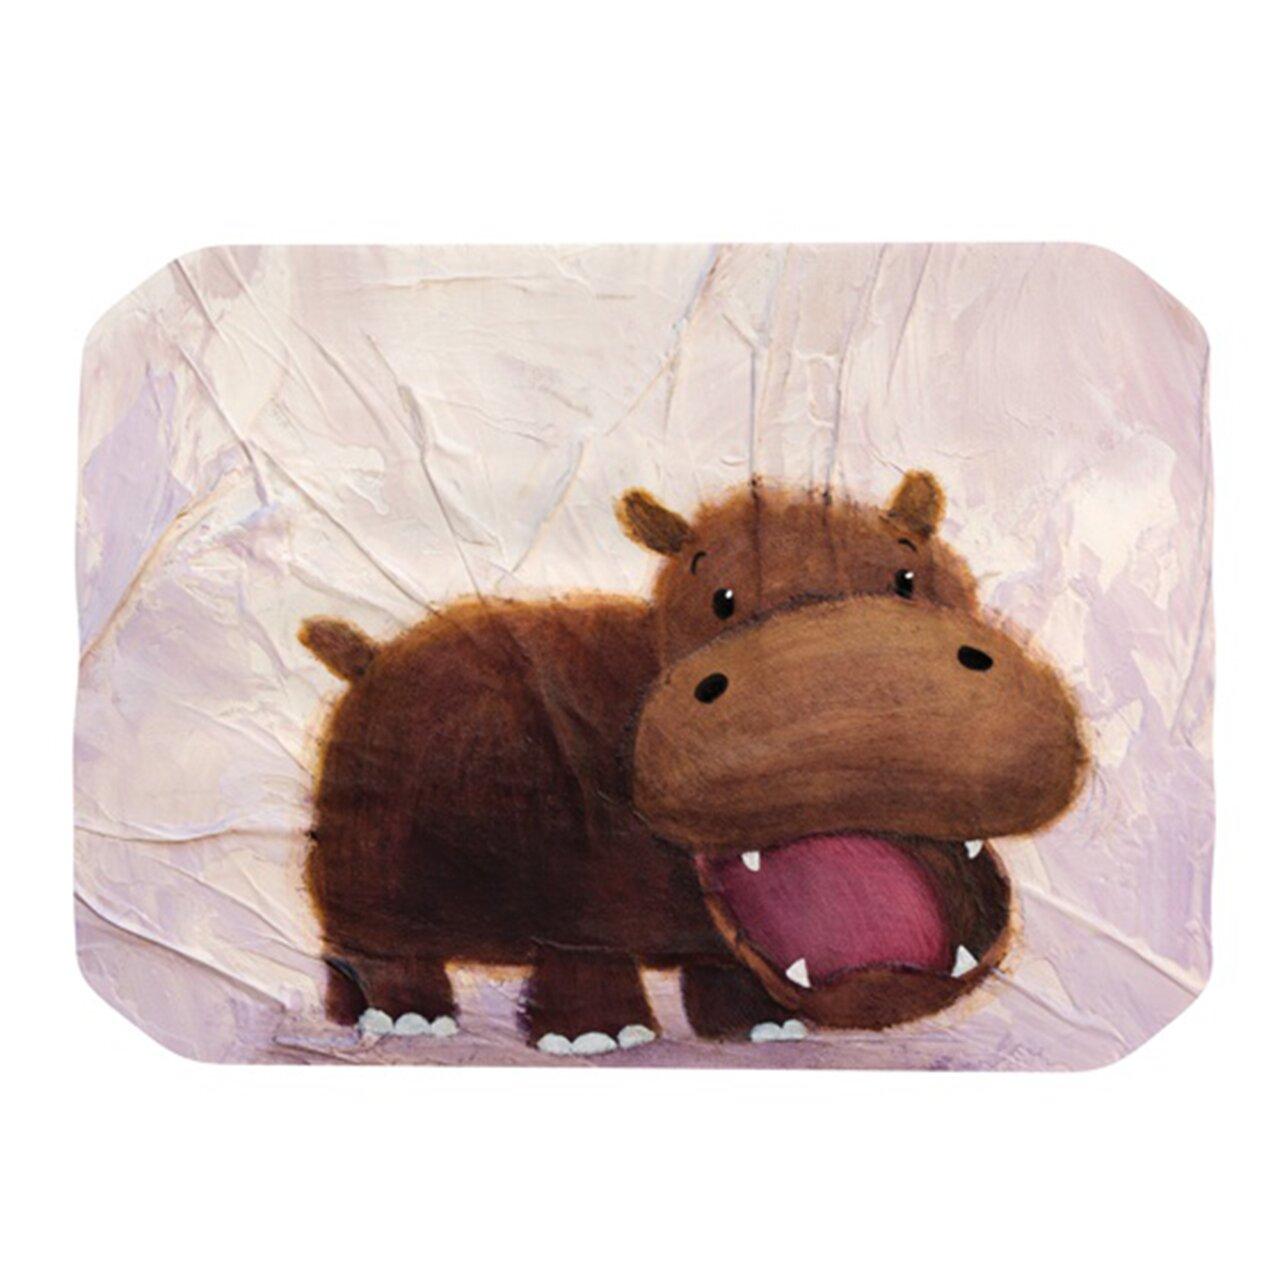 Kess Inhouse The Happy Hippo Placemat Wayfair